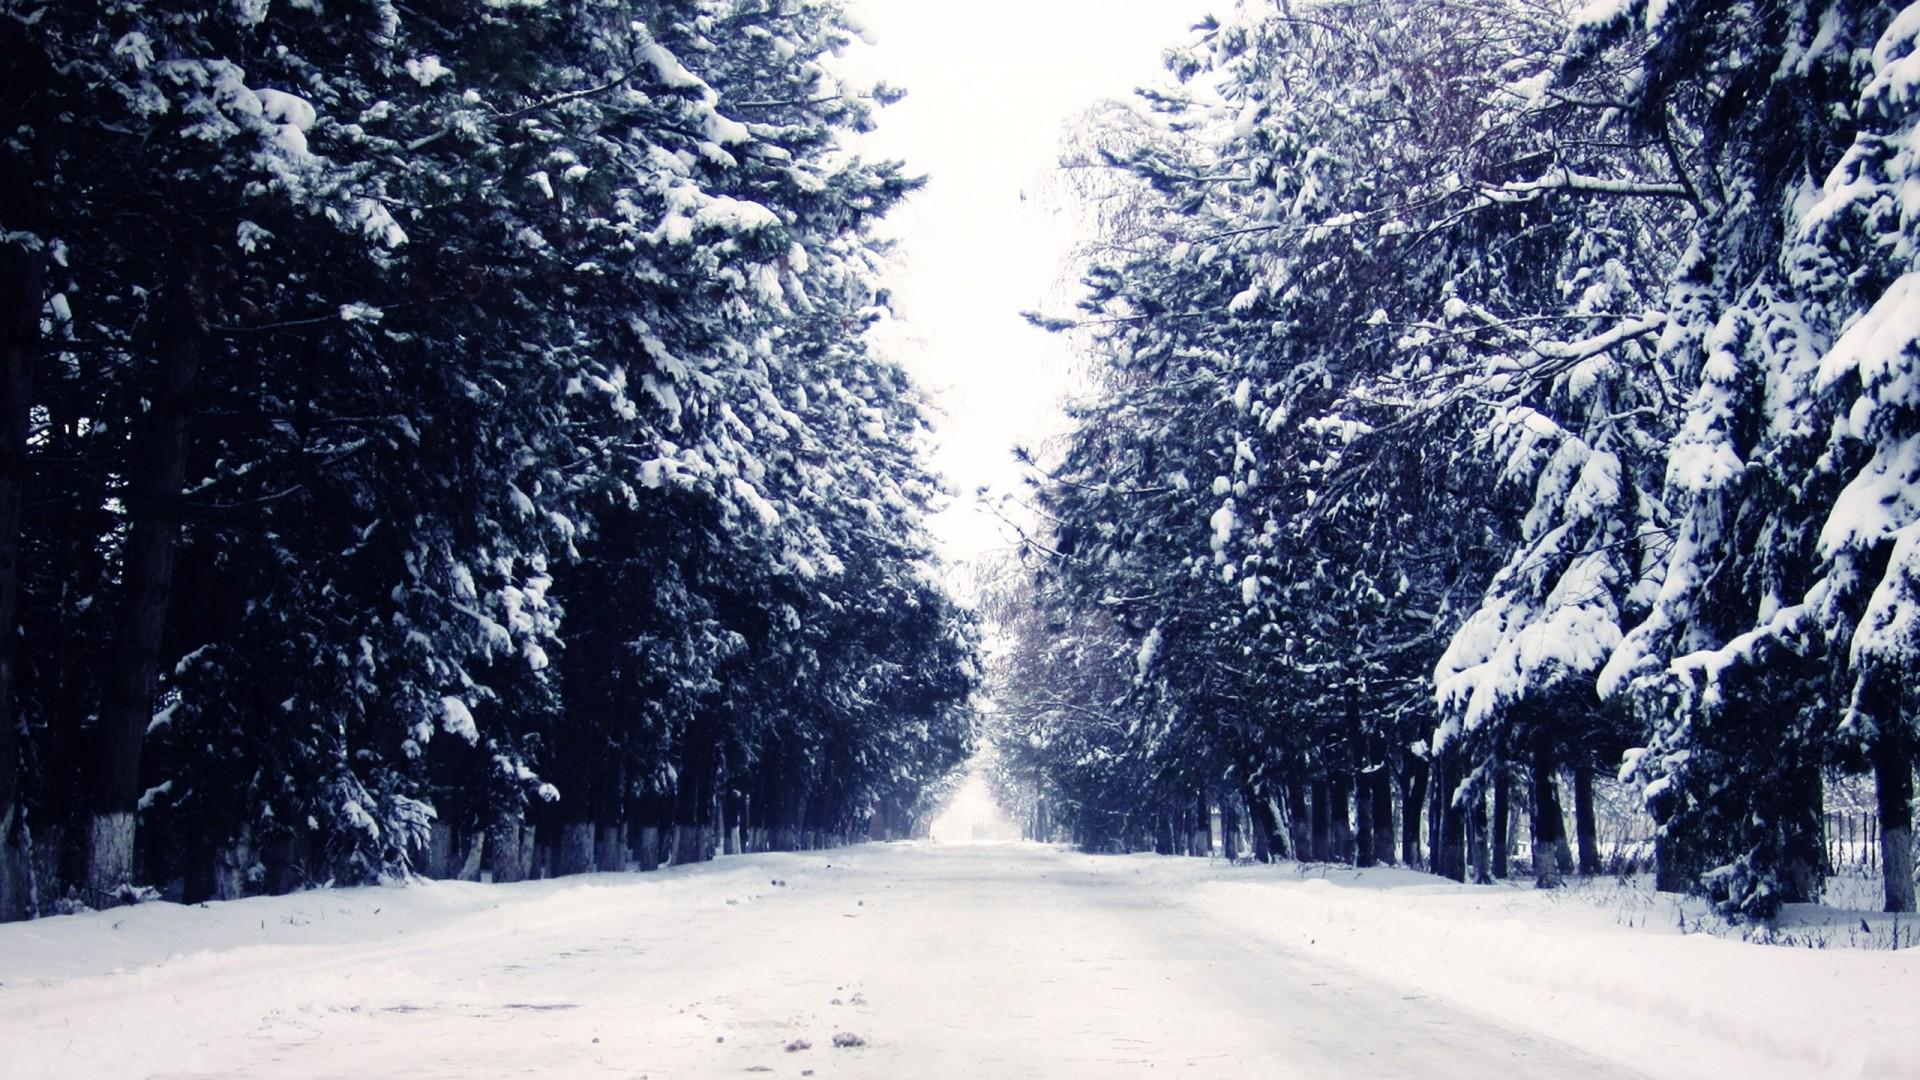 Snow Wallpapers 1920x1080 Full Hd: HD Snow Wallpaper ·①